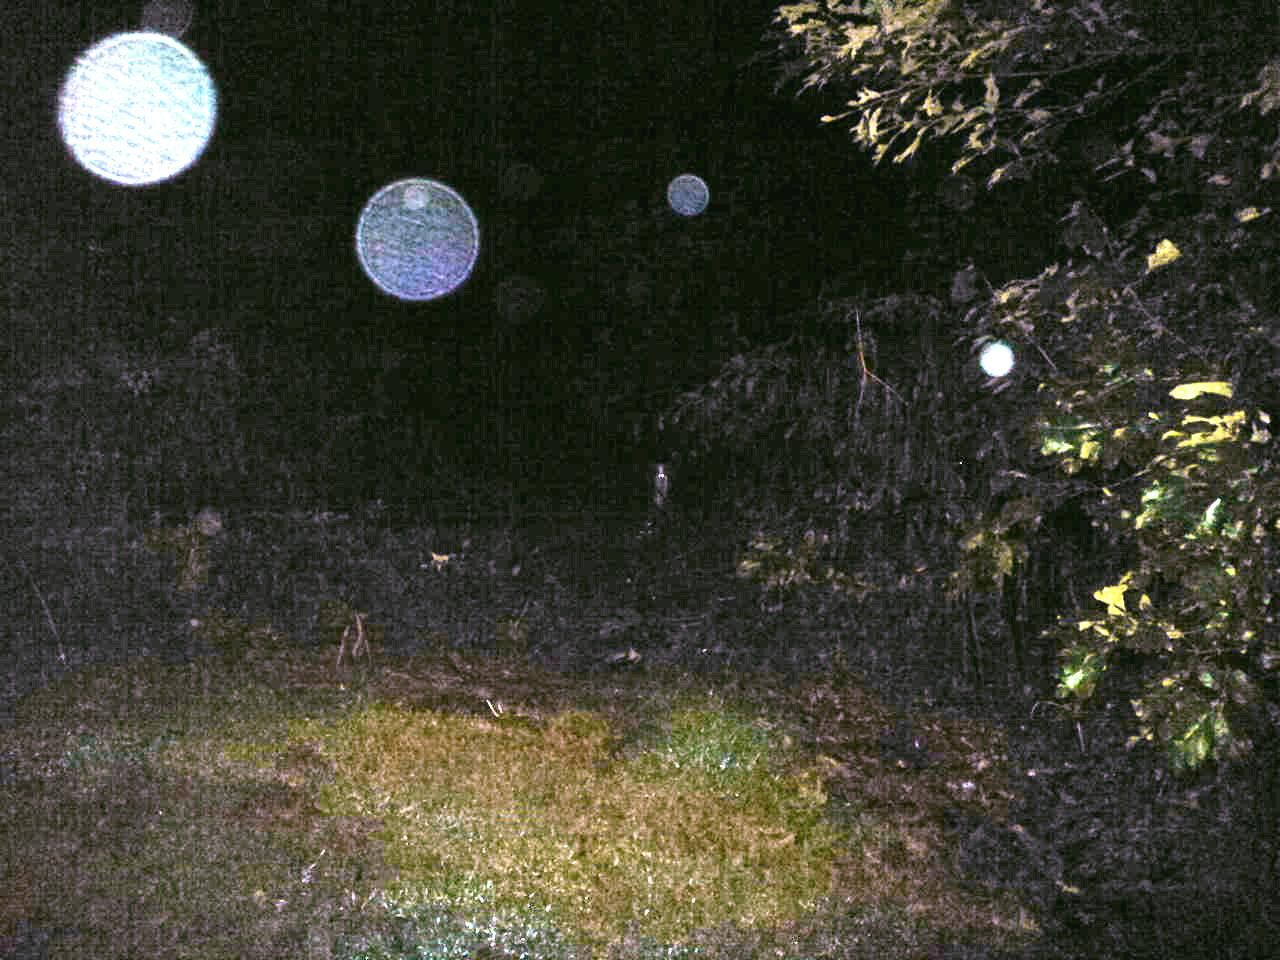 Back Yard Orbs Colors Of Orbs Http Www Pinterest Com Pin 279434351851720024 Orbs In Photos Ghost Orbs Orb